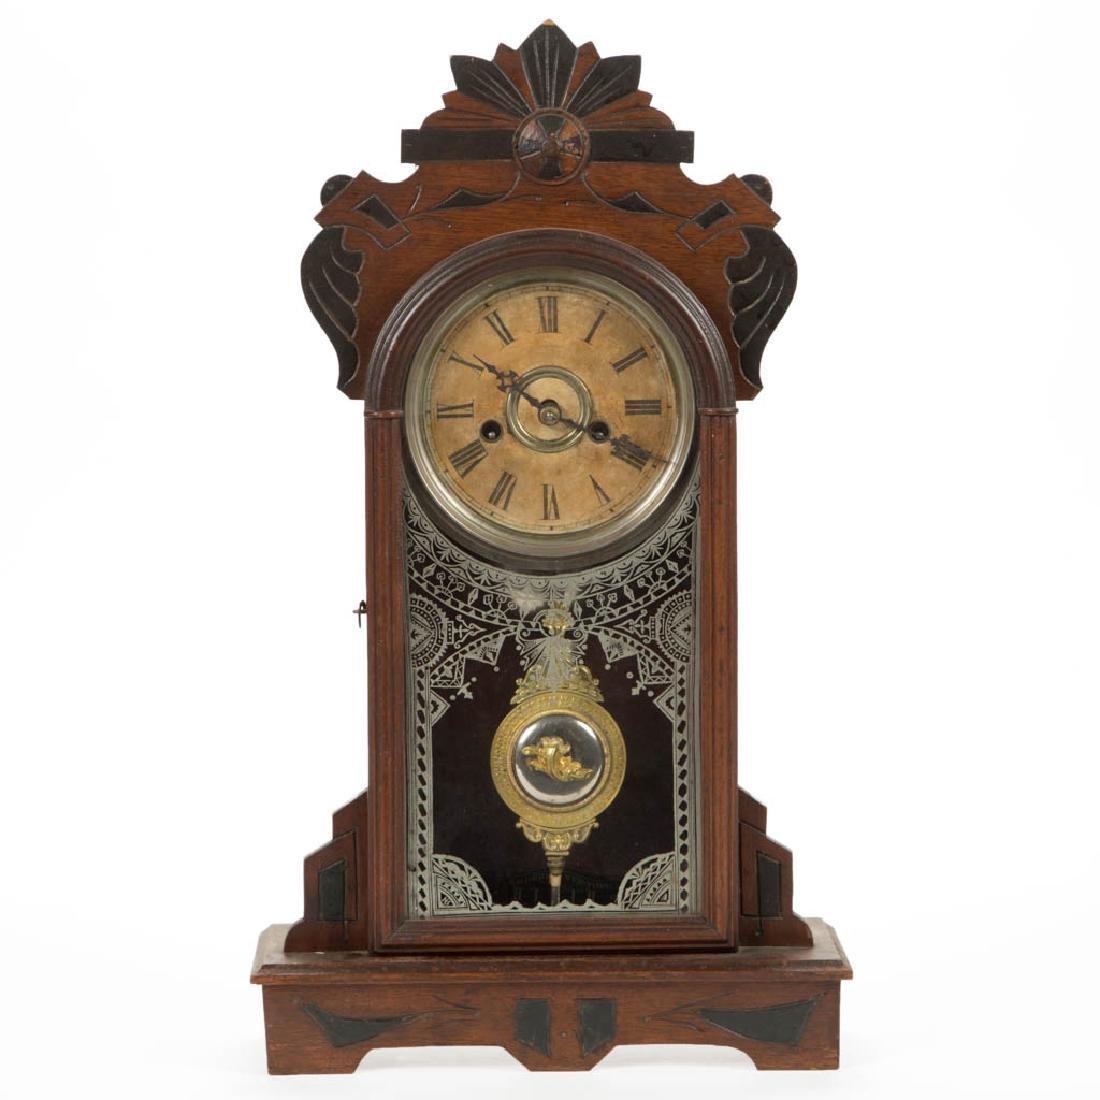 F. KROEBER KITCHEN SHELF CLOCK